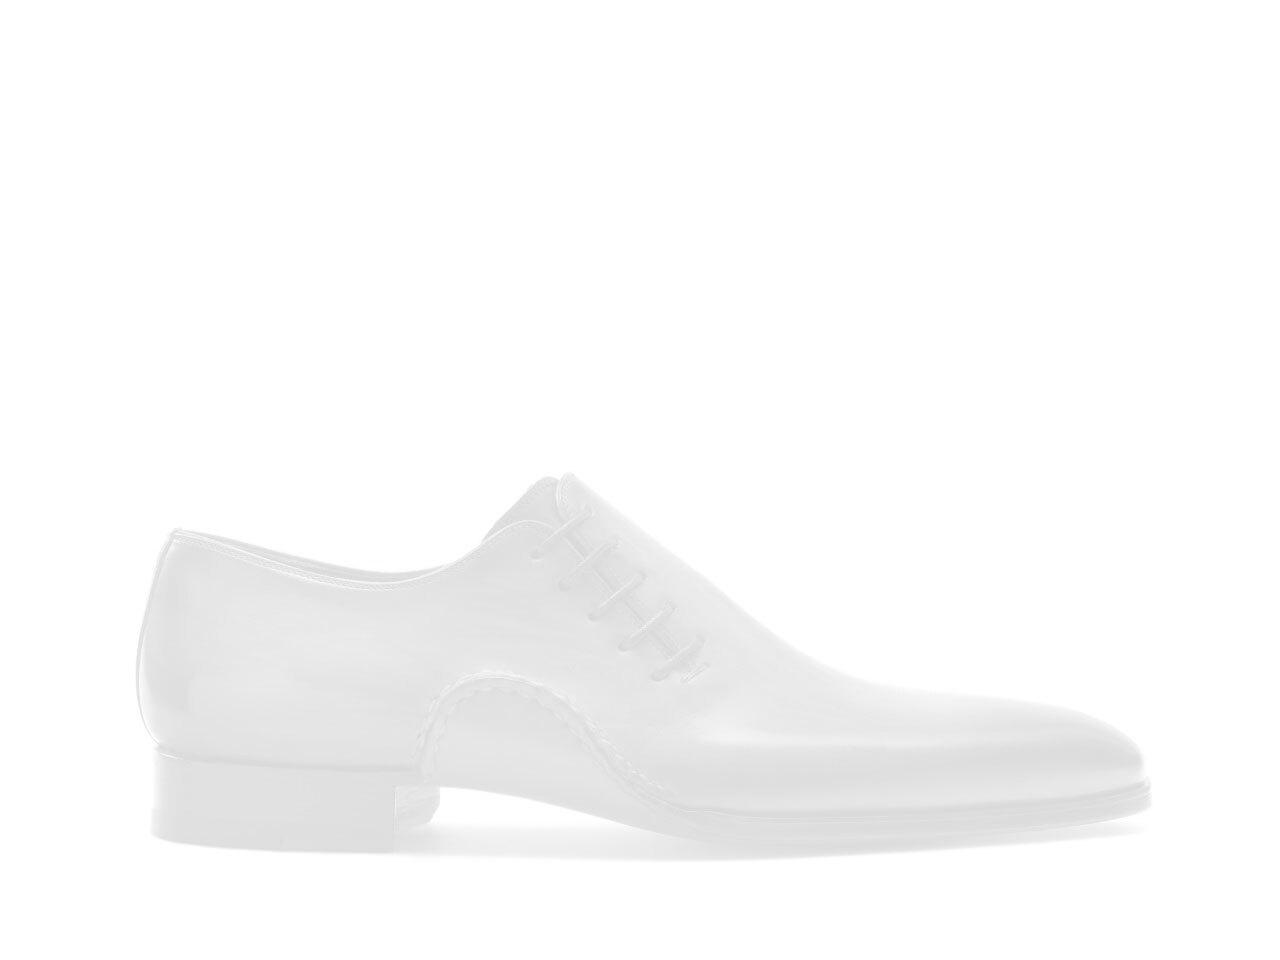 Pair of the Magnanni Cruz Royal Men's Oxford Shoes